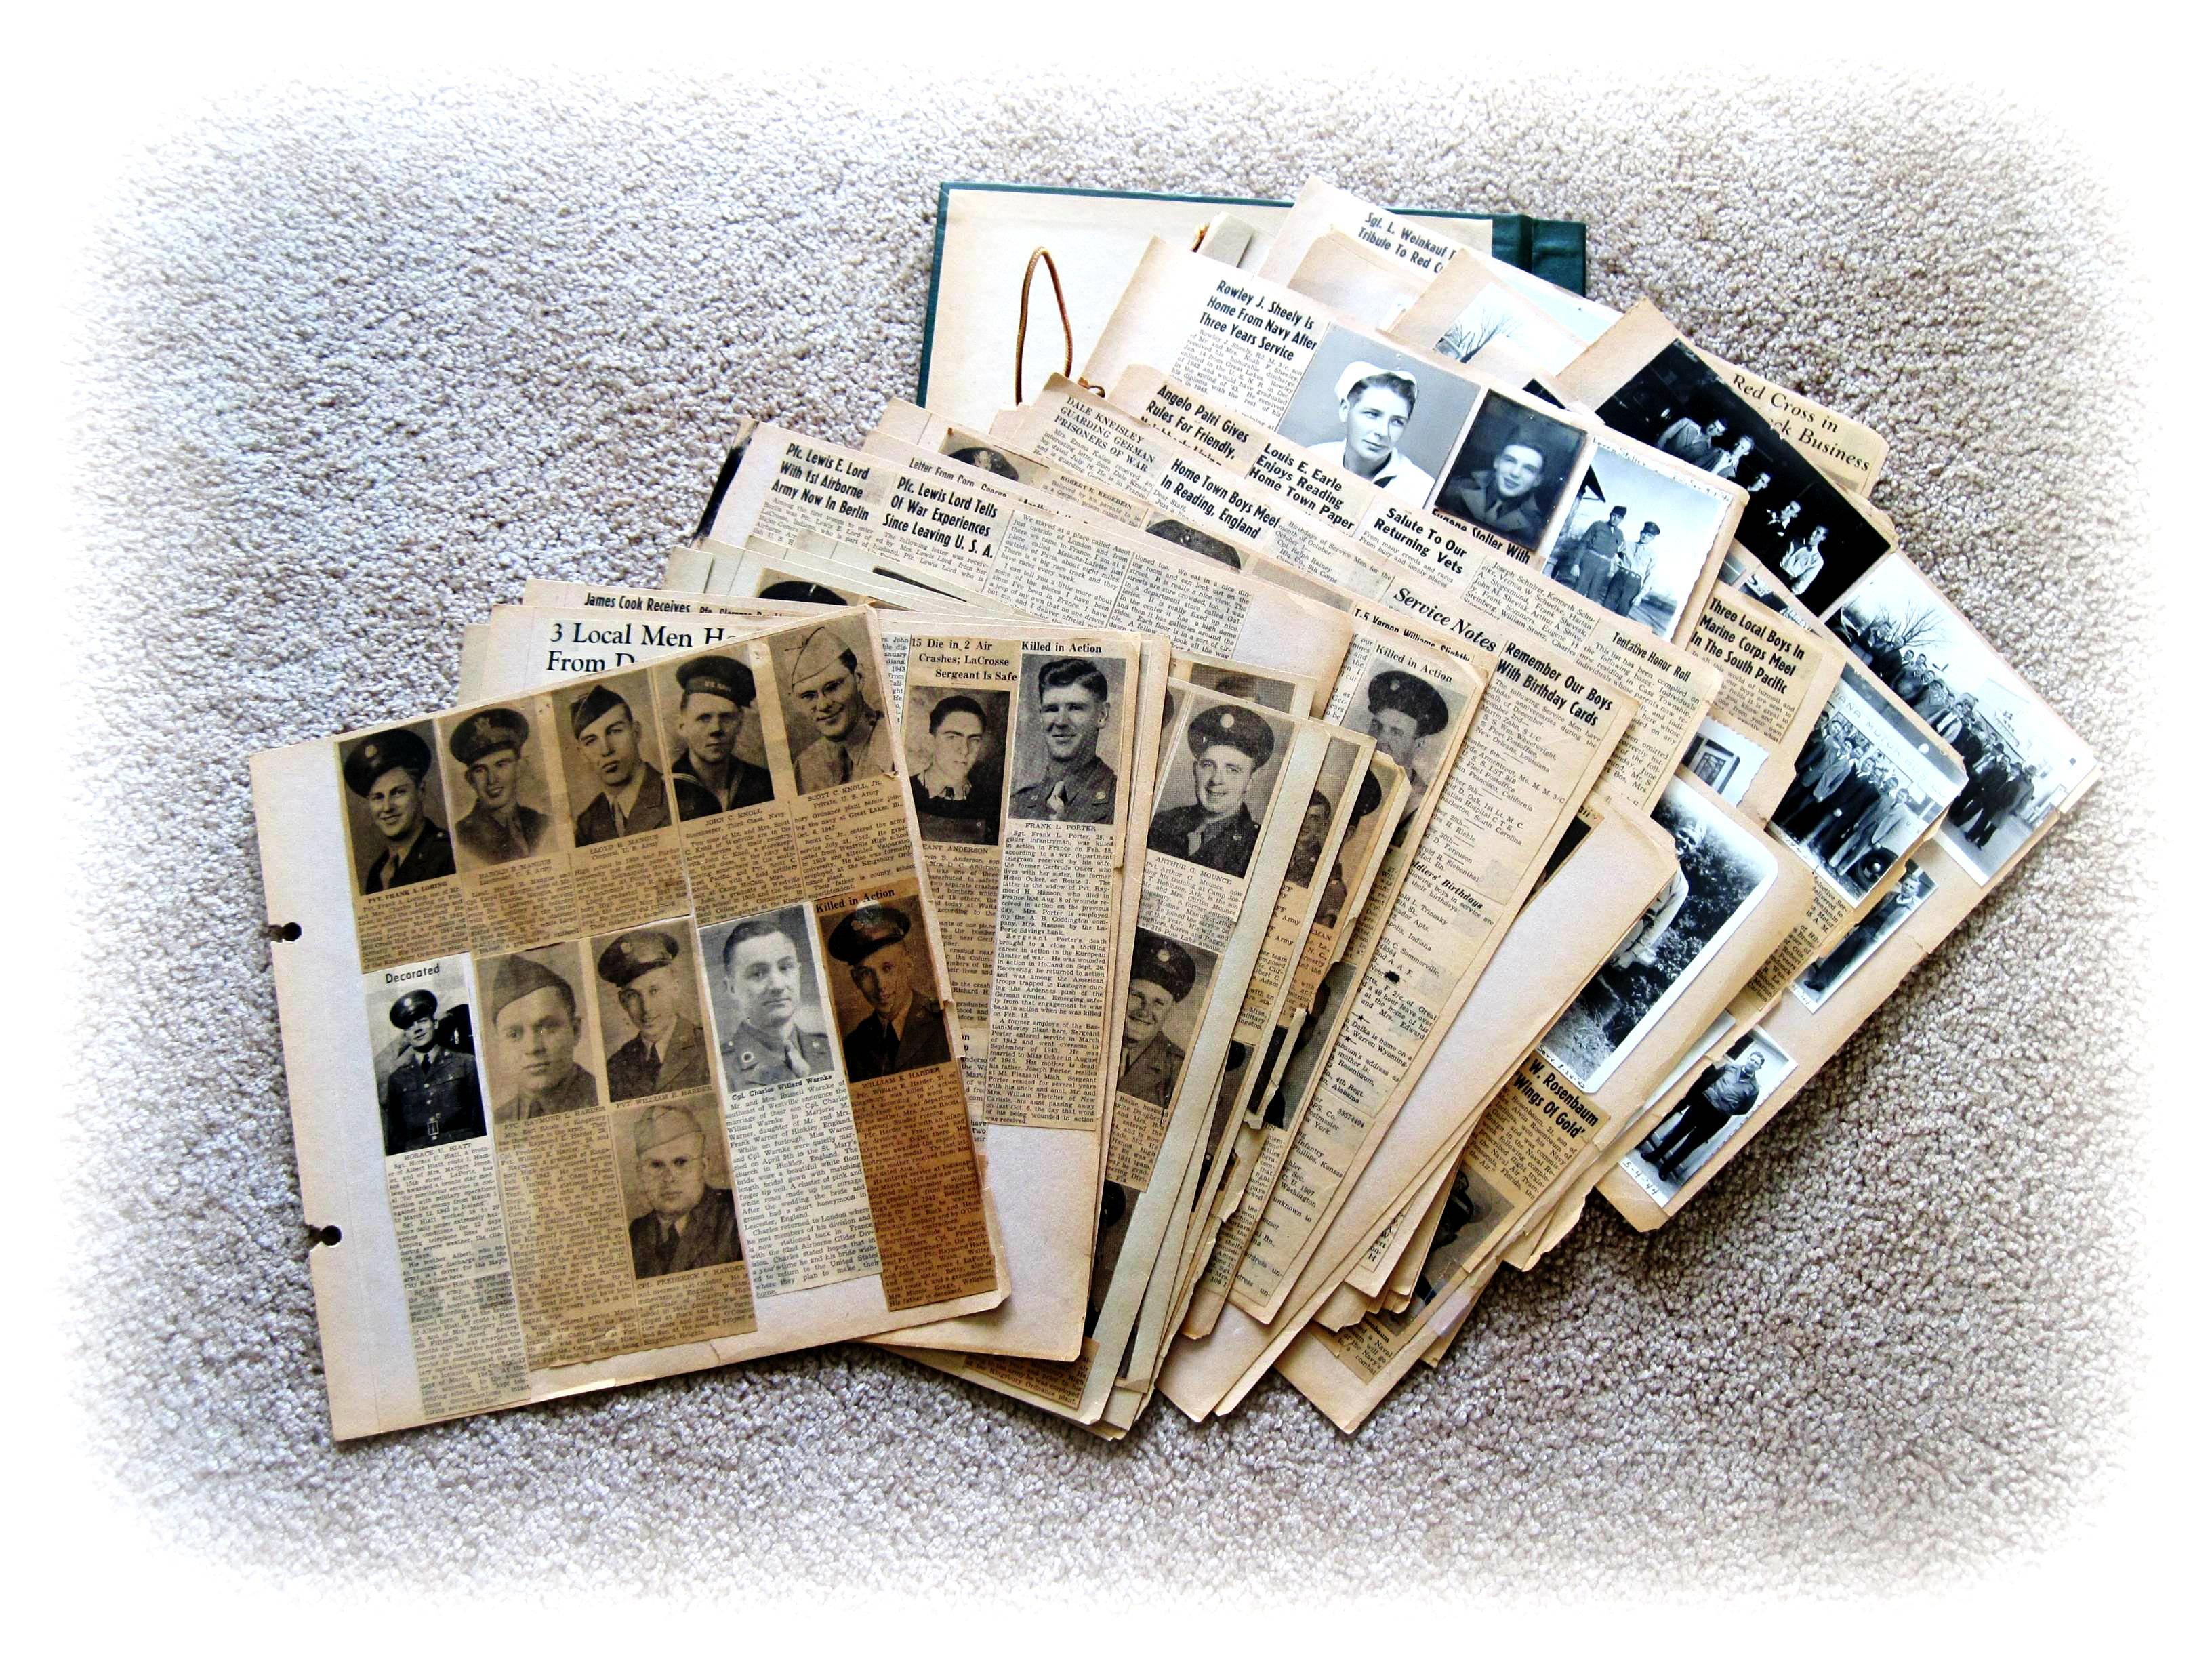 Scrapbook paper england - Clara Klawetter Of Lacrosse Wife Of Jule Klawetter Served As A Clerk On Selective Service Board No 3 Clara Kept A Scrapbook During World War Ii Of The